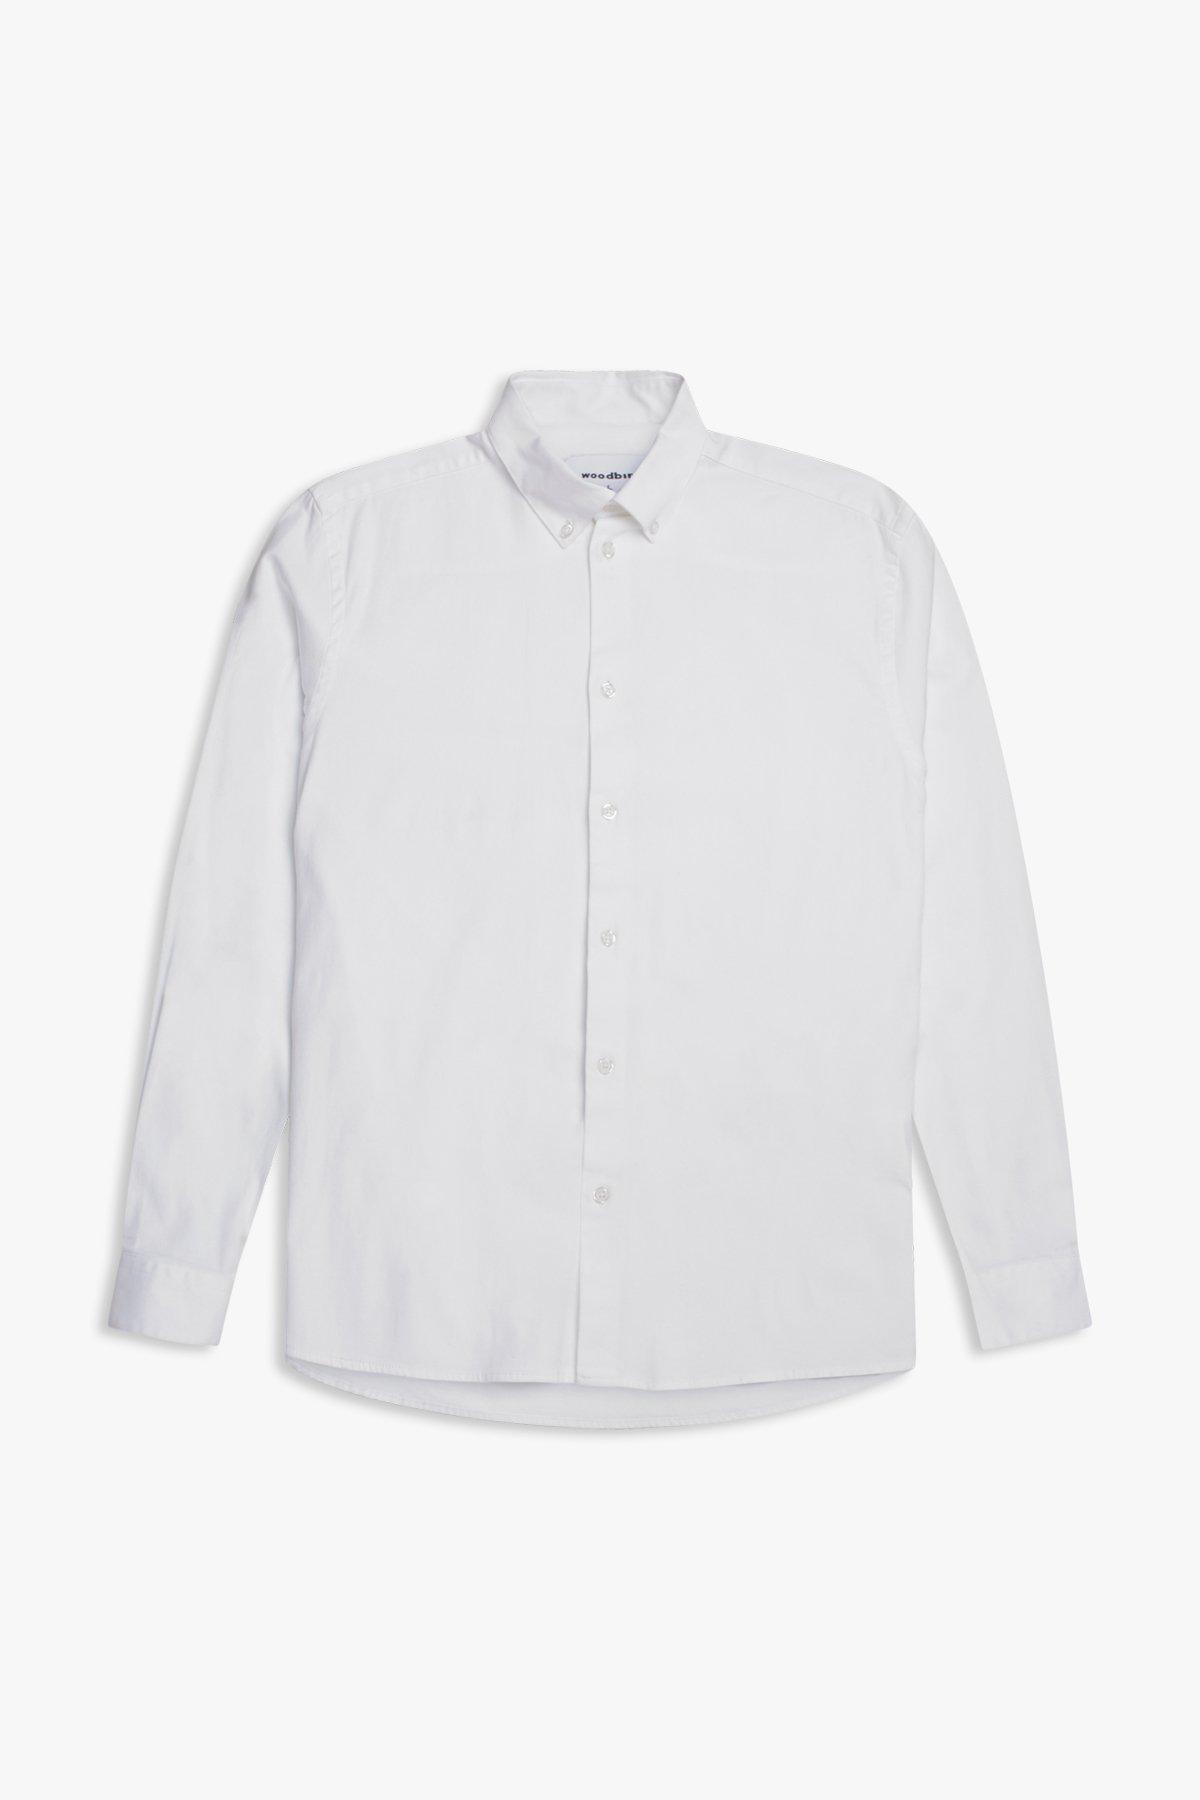 Woodbird Trime skjorte